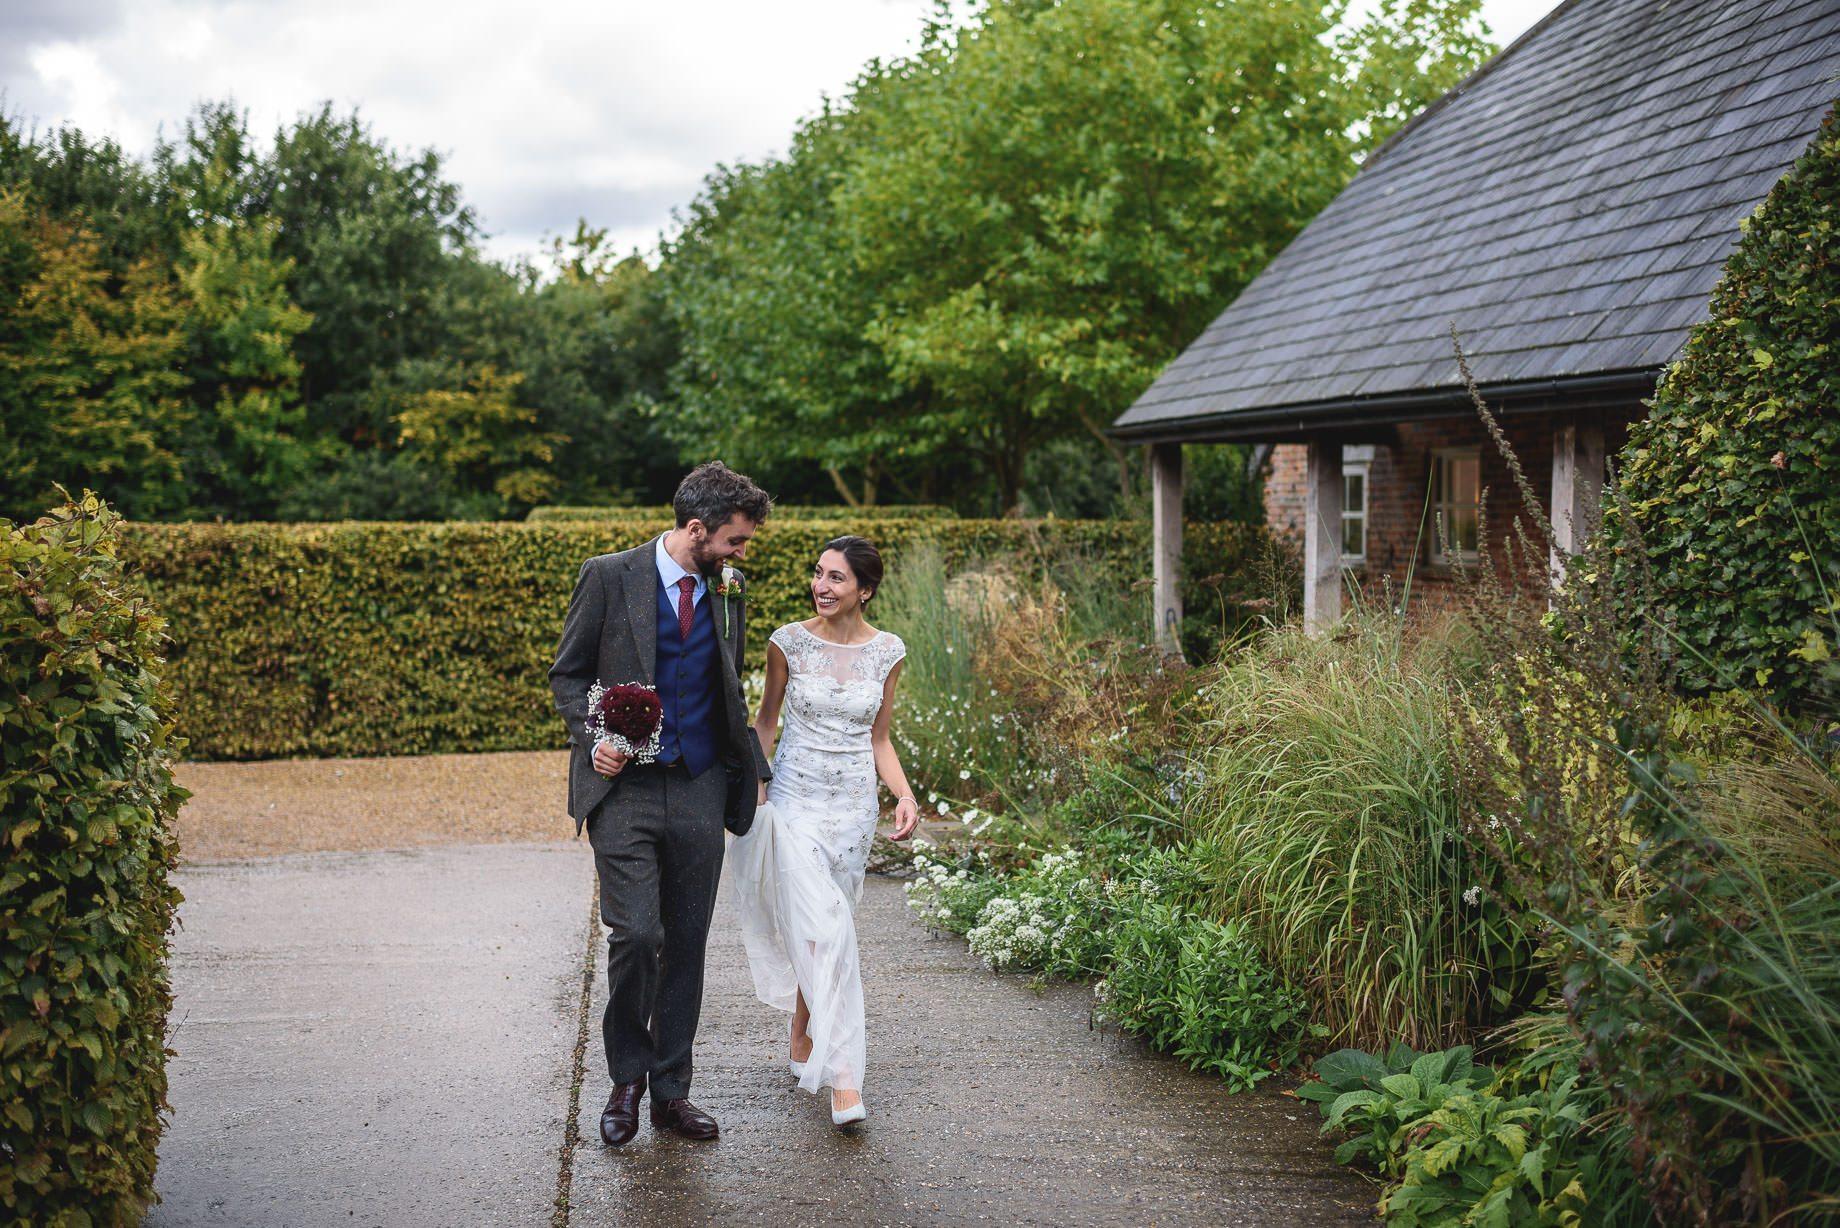 bury-court-barn-wedding-photography-guy-collier-photography-nadia-tom-70-of-184